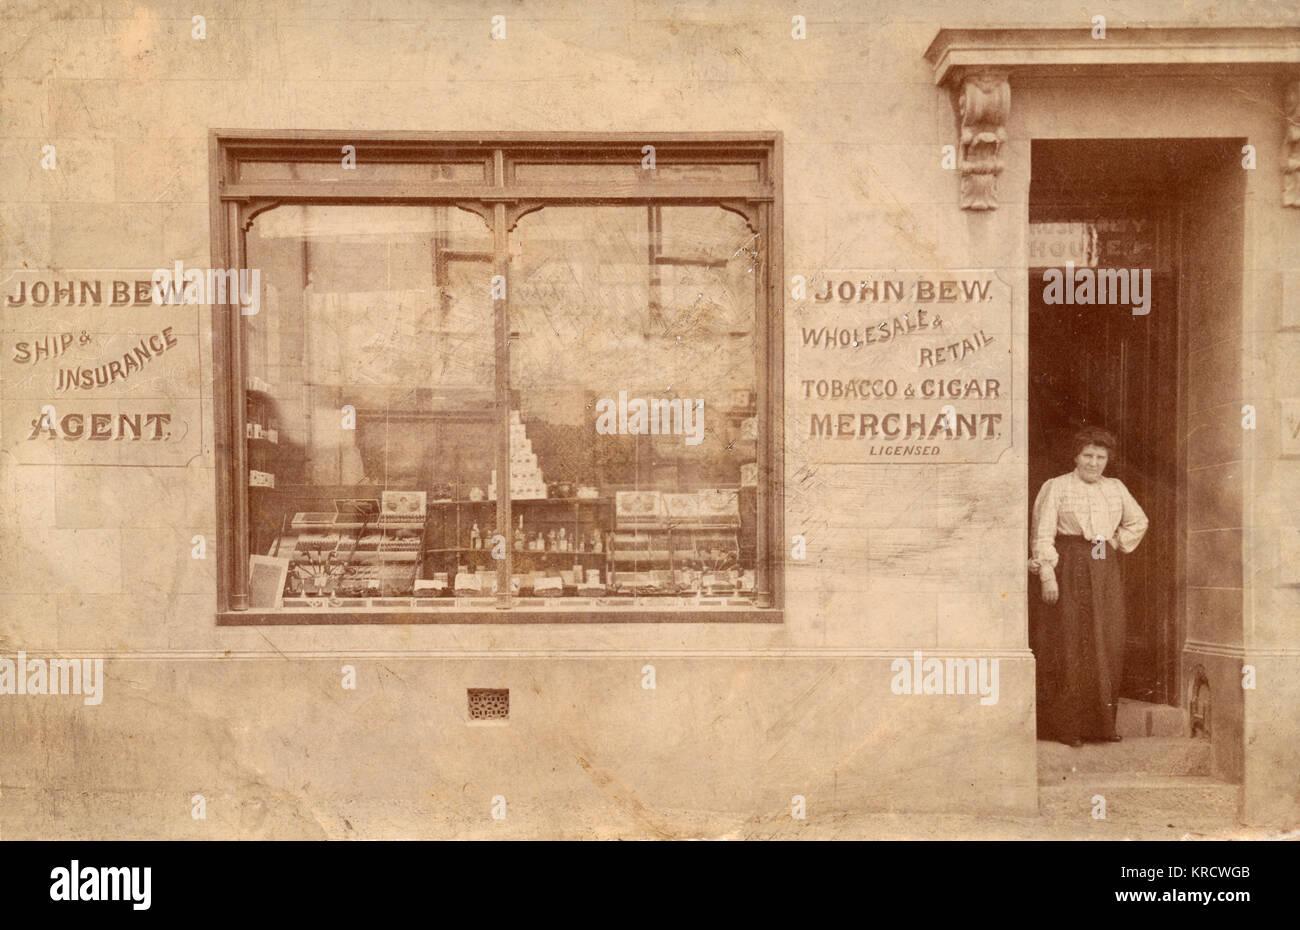 John Bew, Wholesale & Retail Tobacco & Cigar Merchant, and Ship Insurance Agent -- his shop front - Stock Image